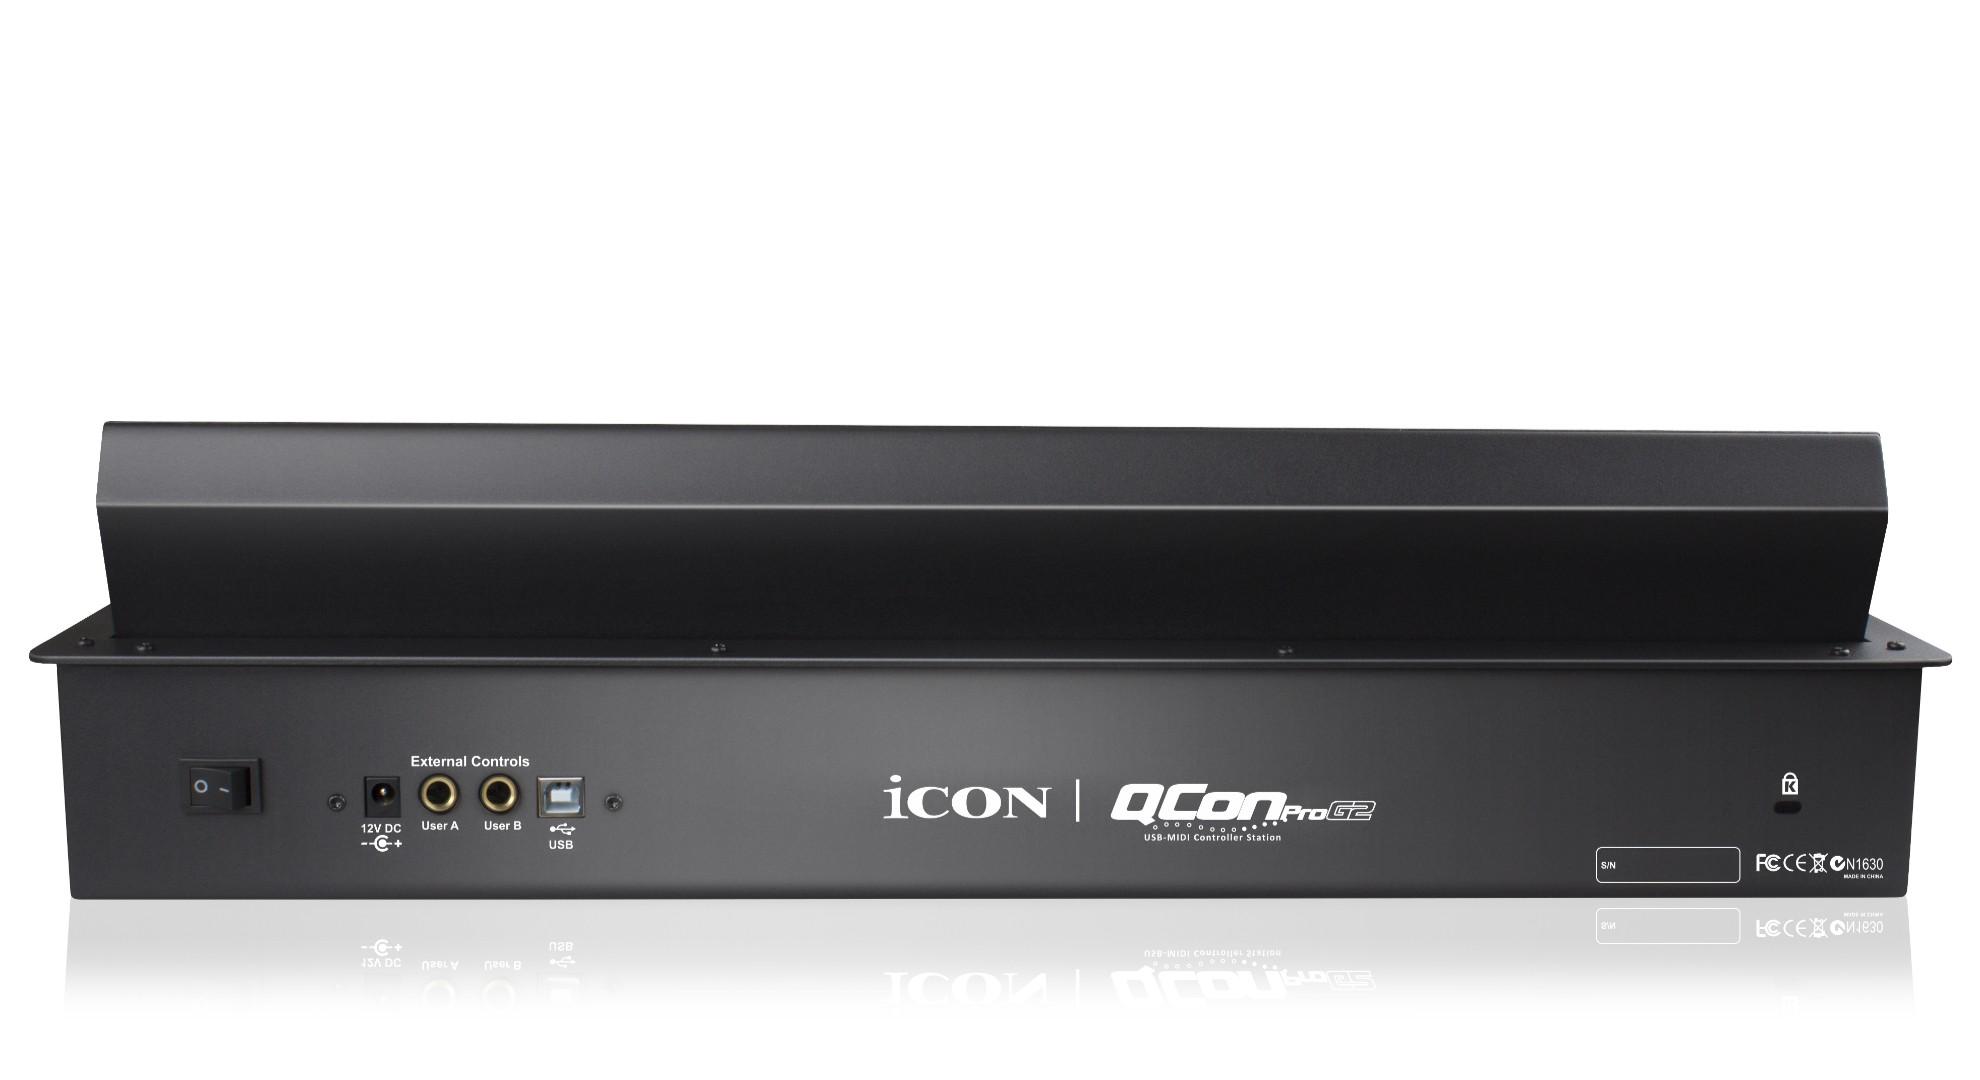 Icon Qcon Pro G2 Rear.jpg